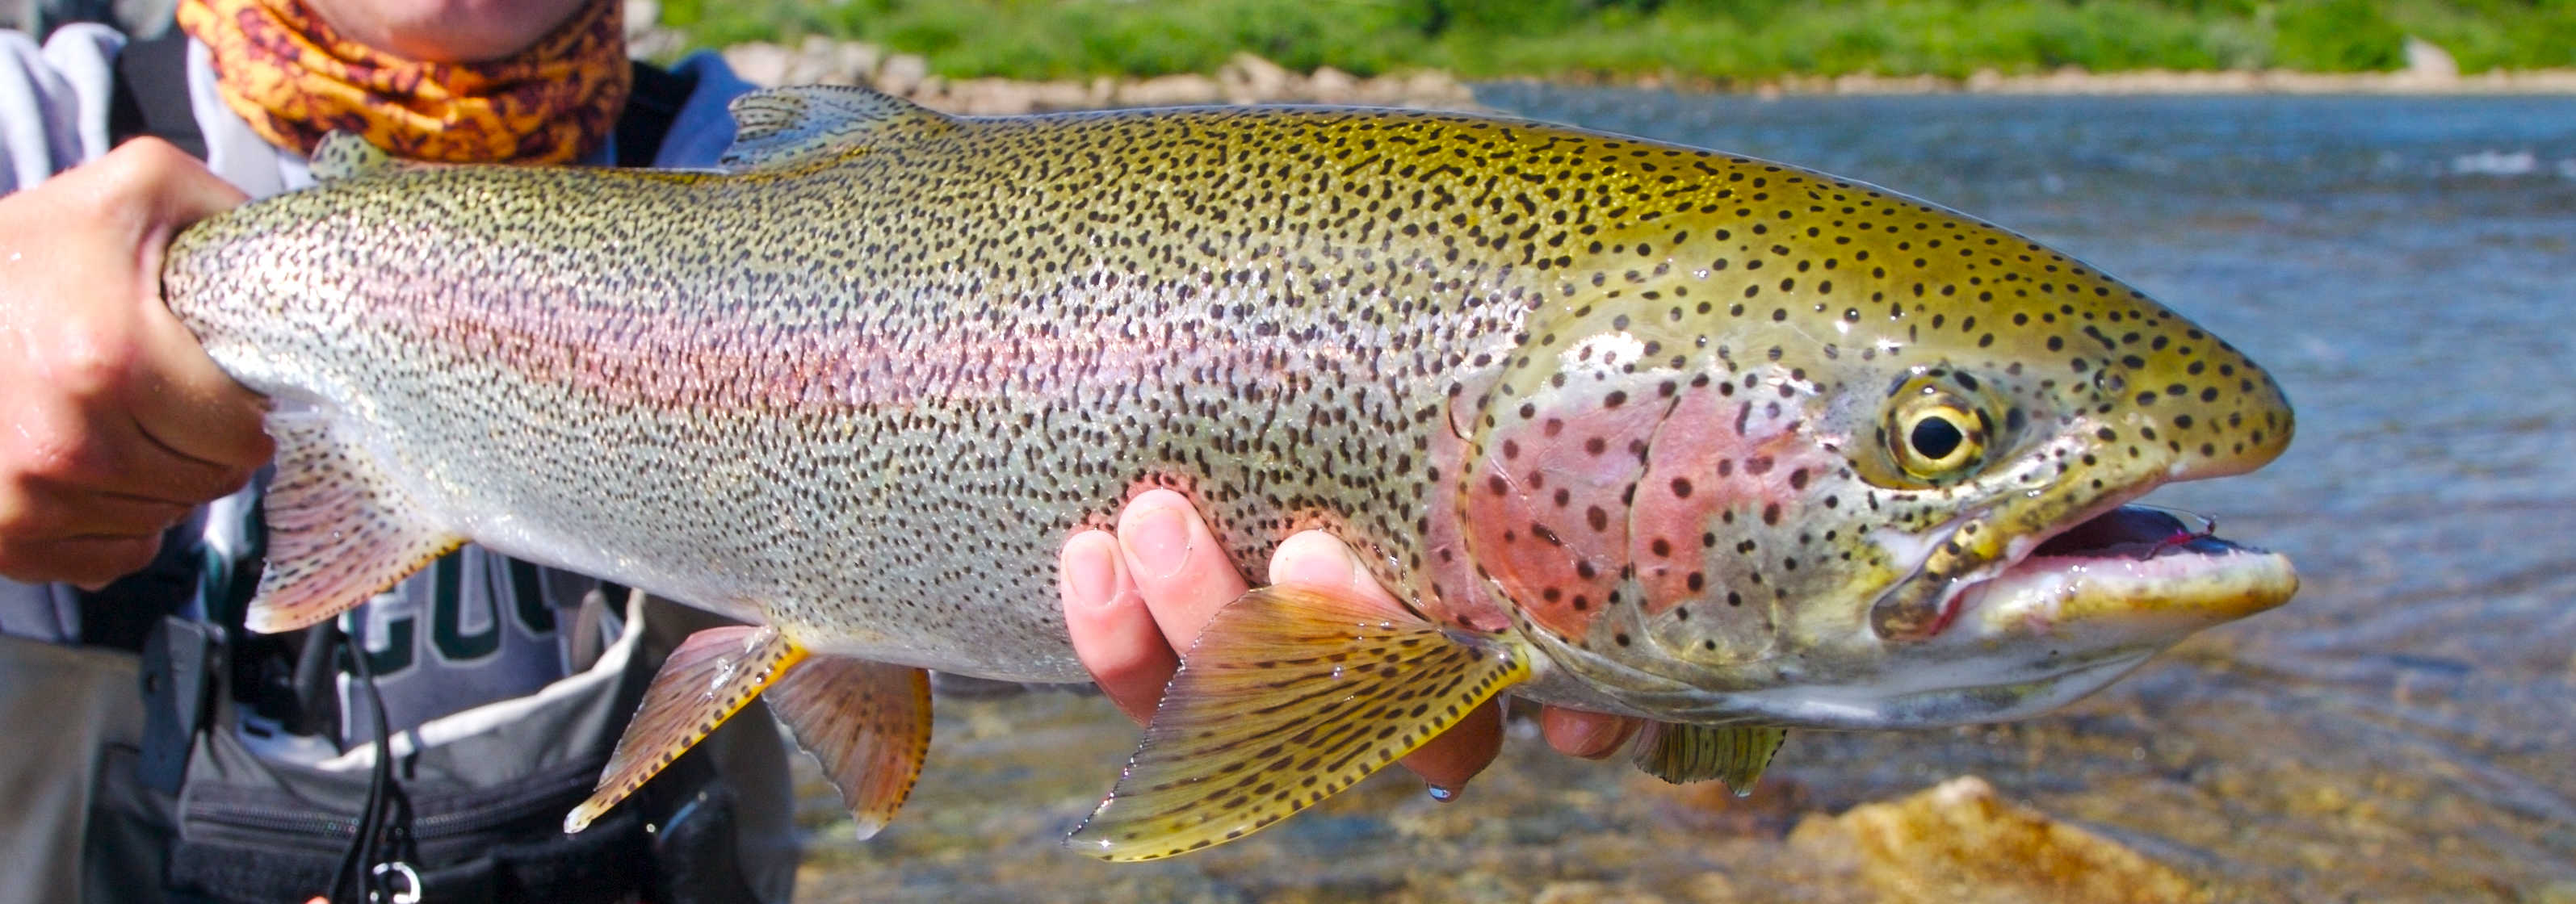 Freshwater fish kidney dilute urine - Freshwater Fish Kidney Dilute Urine